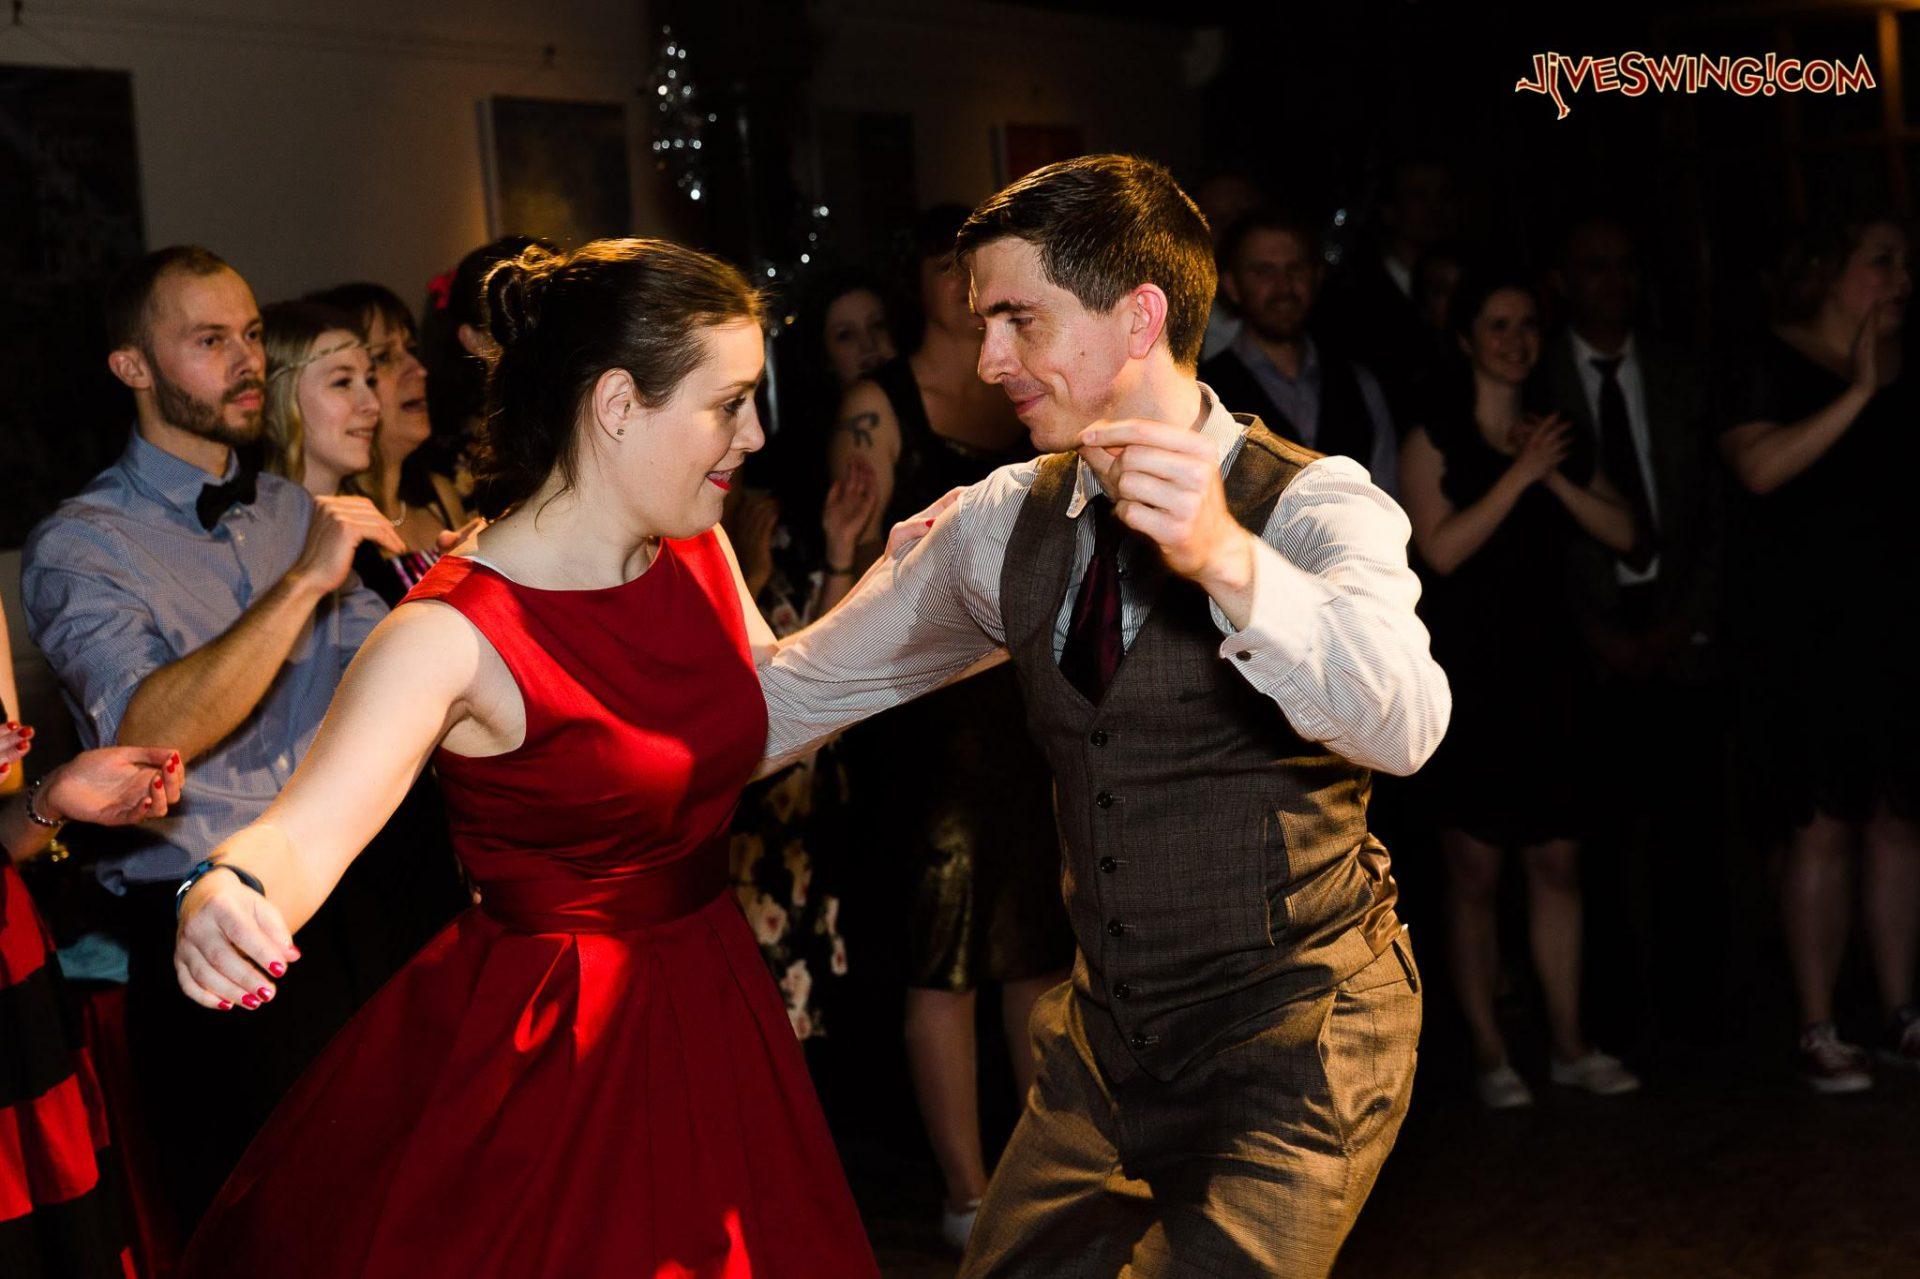 Swing Dancing Jiveswing.com